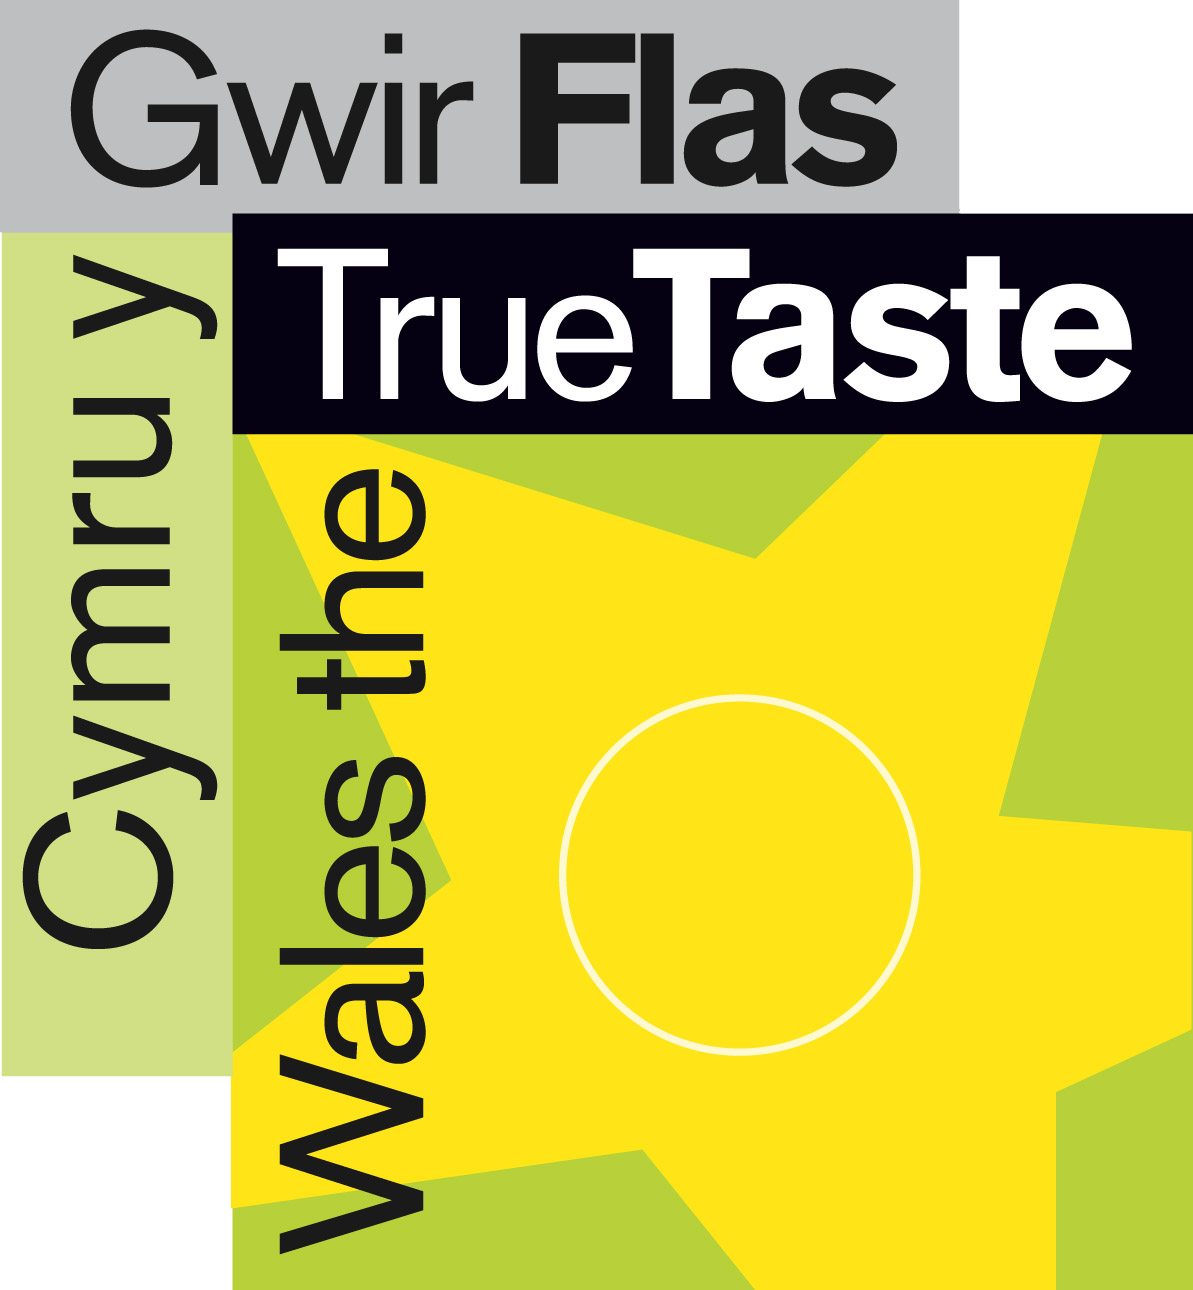 wales_true_taste